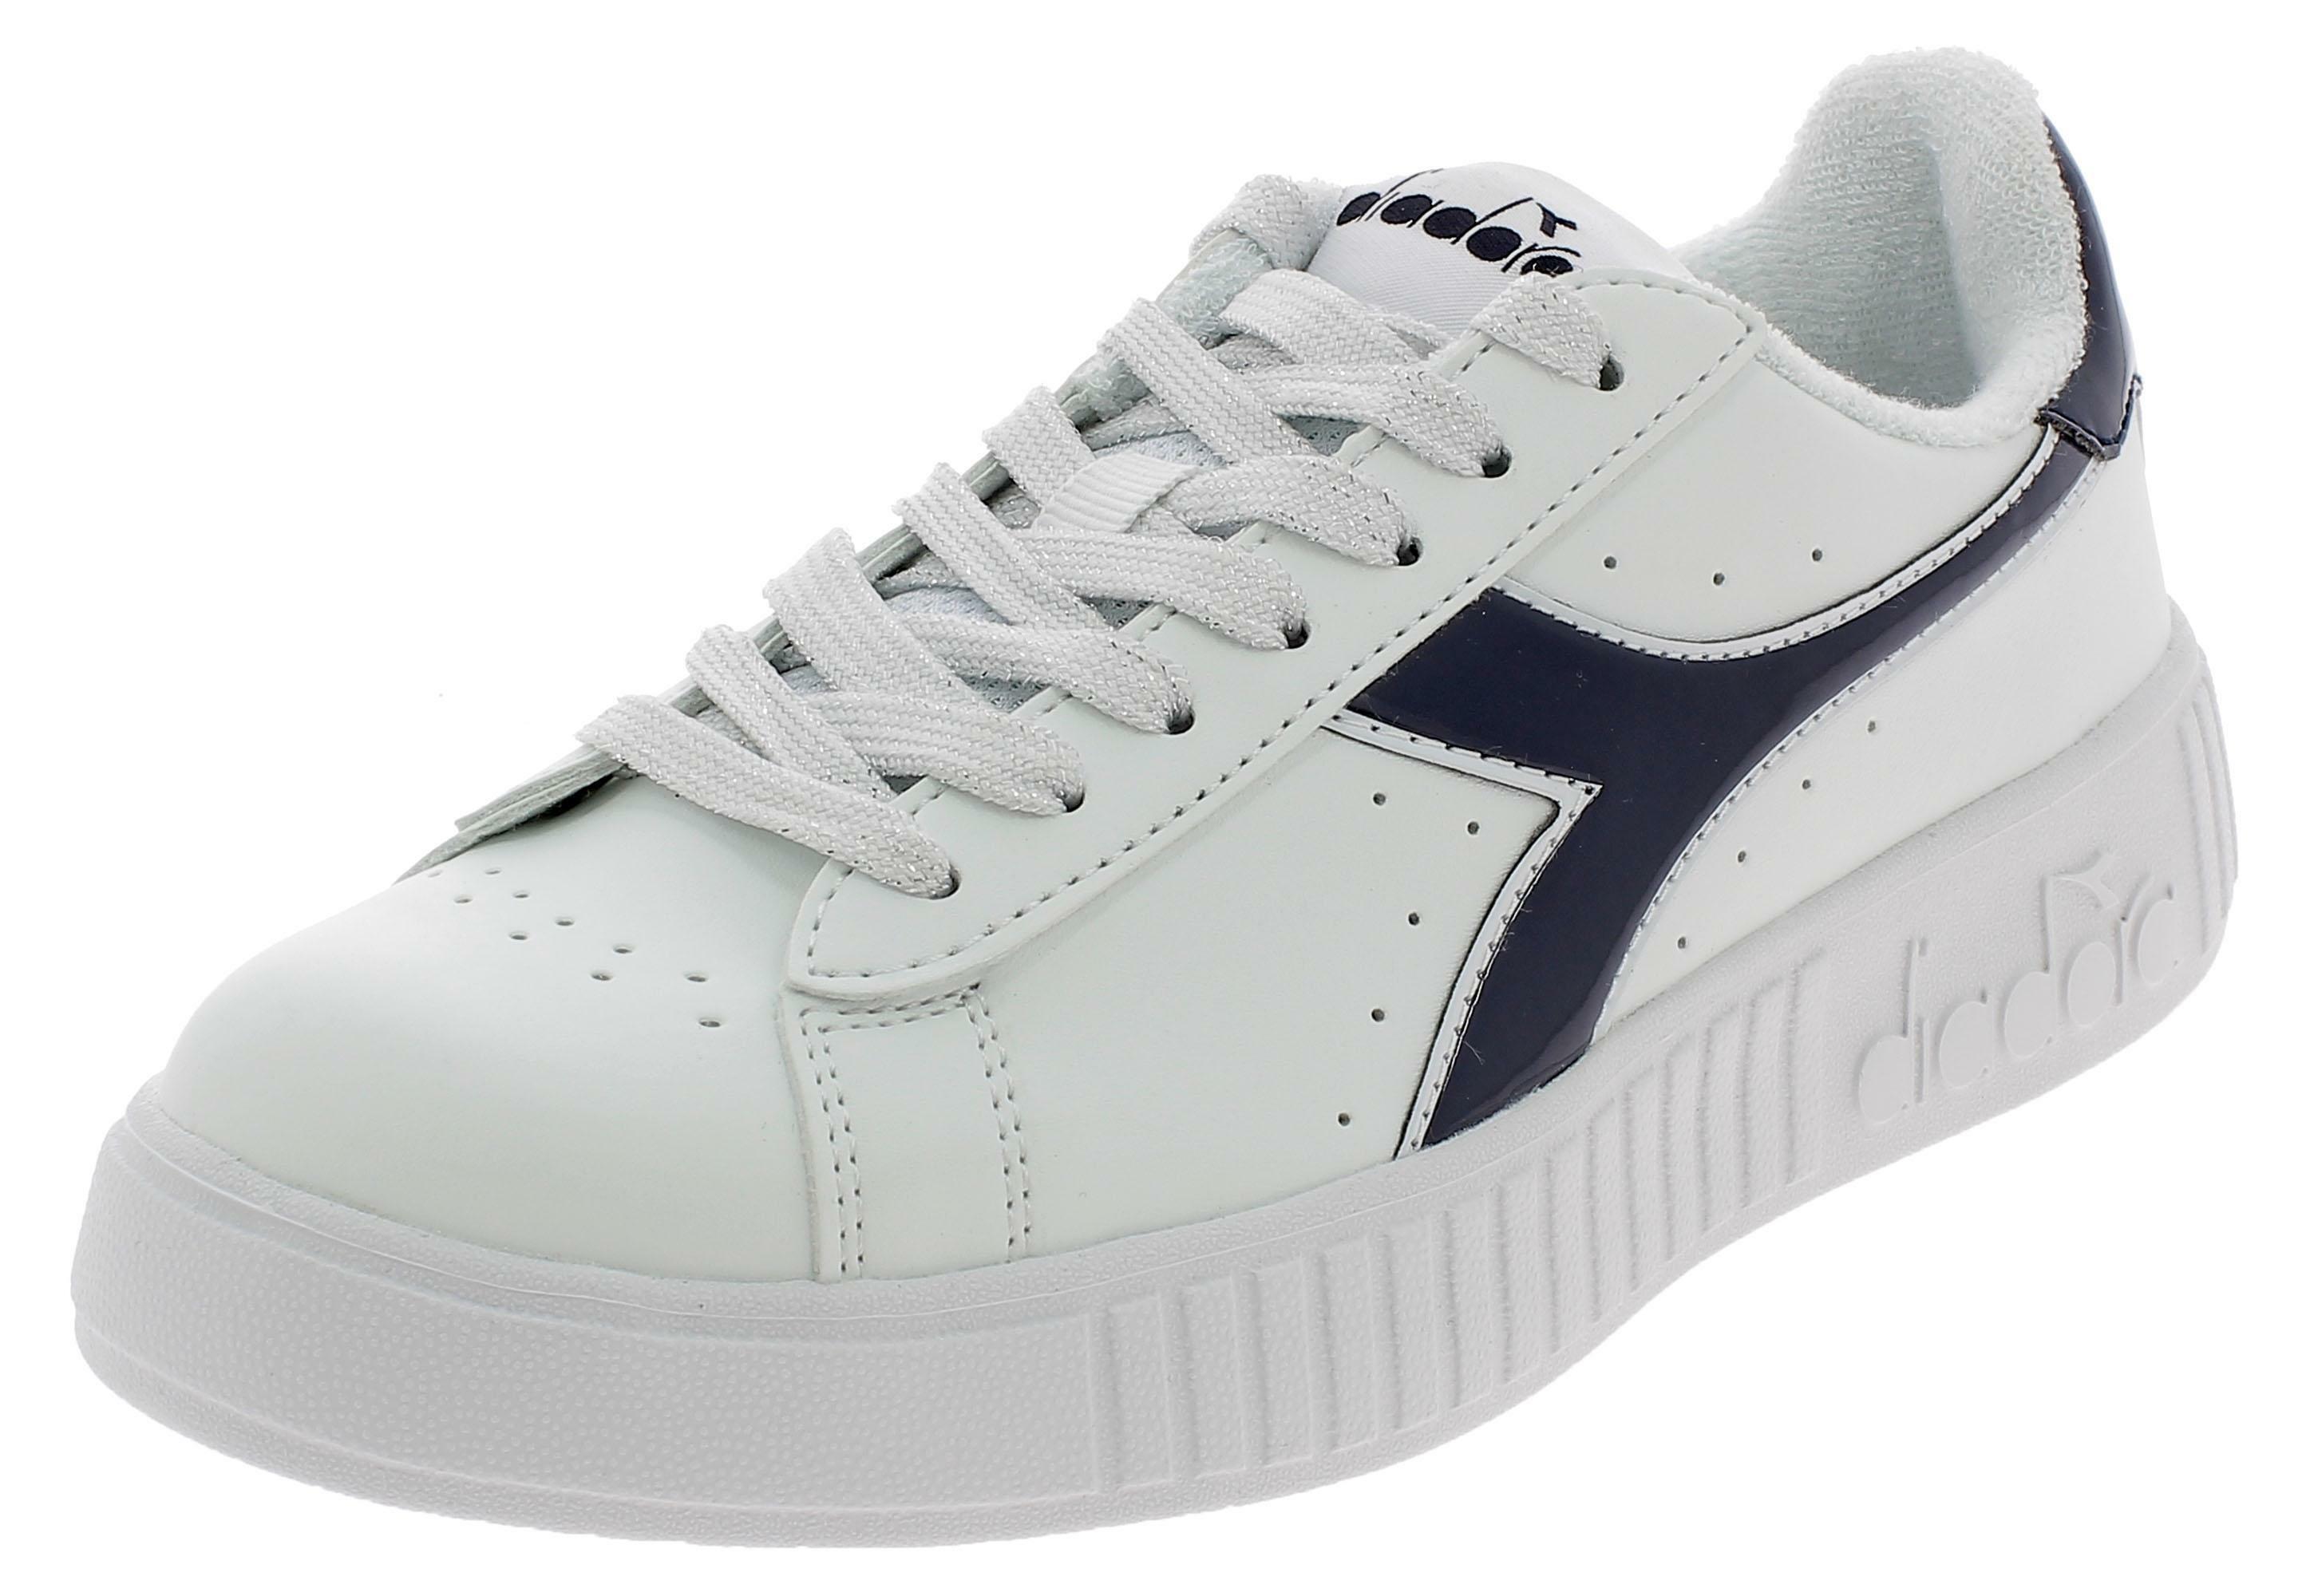 buy online ef441 e4eee Diadora game p step scarpe sportive donna bianche 17436560063